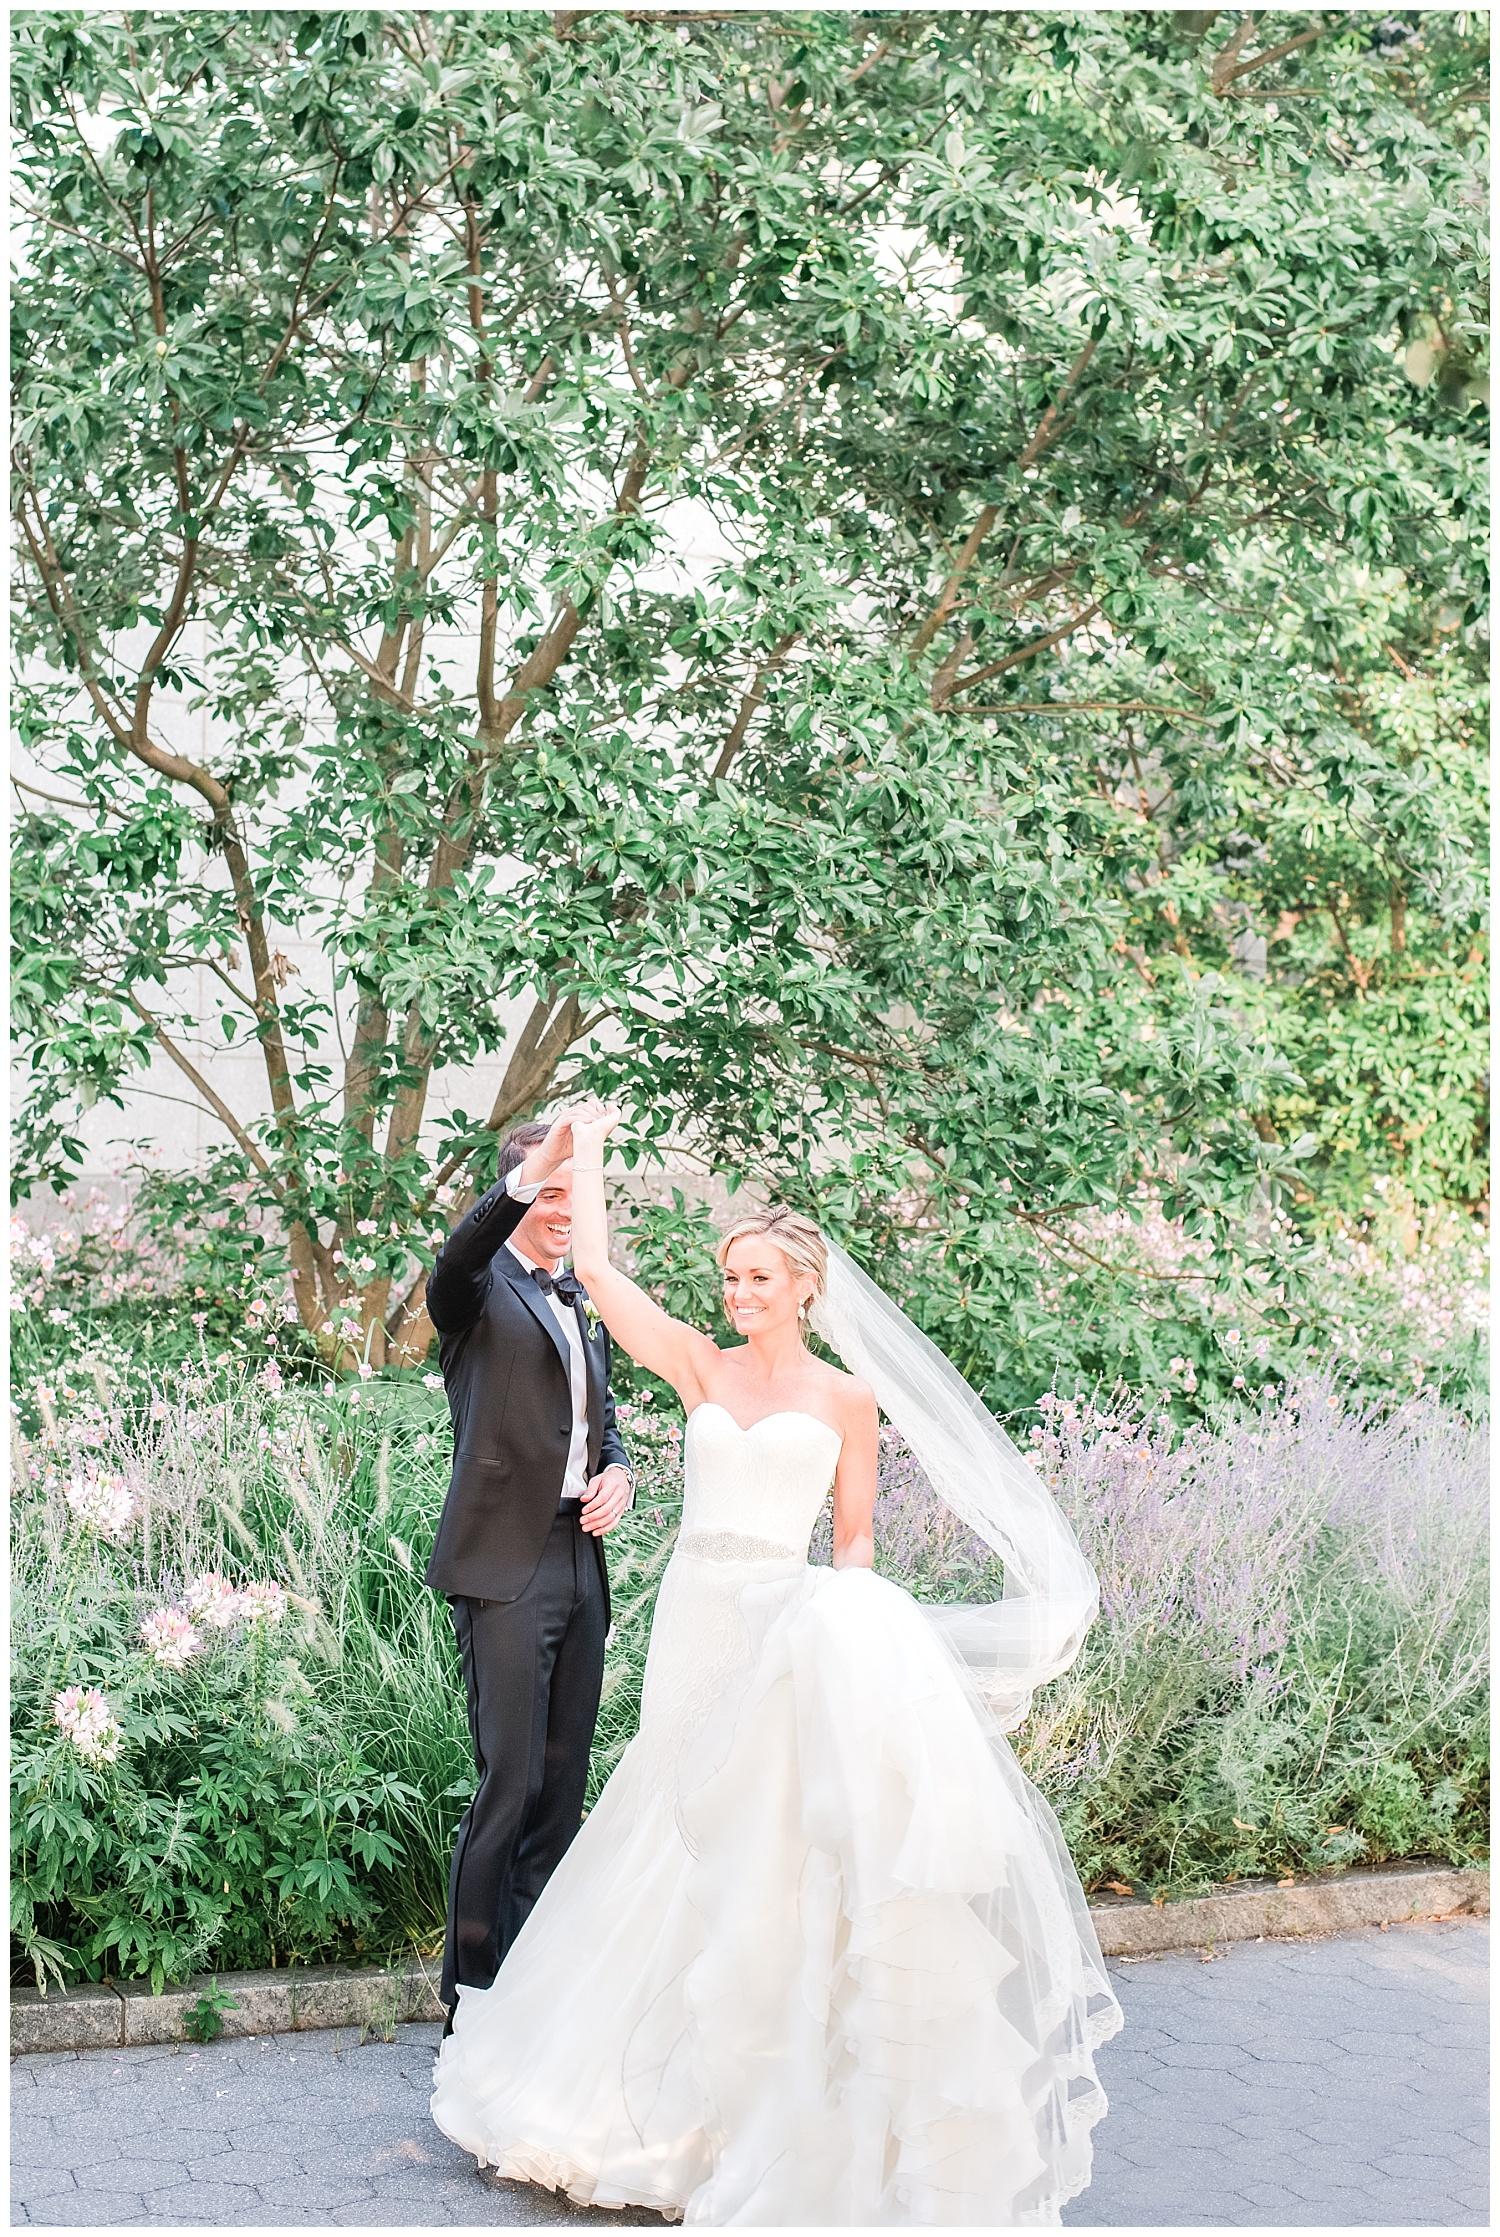 Chelsea_Piers_Lighthouse_Wedding_Fabiana_Skubic_Photography (40).jpg